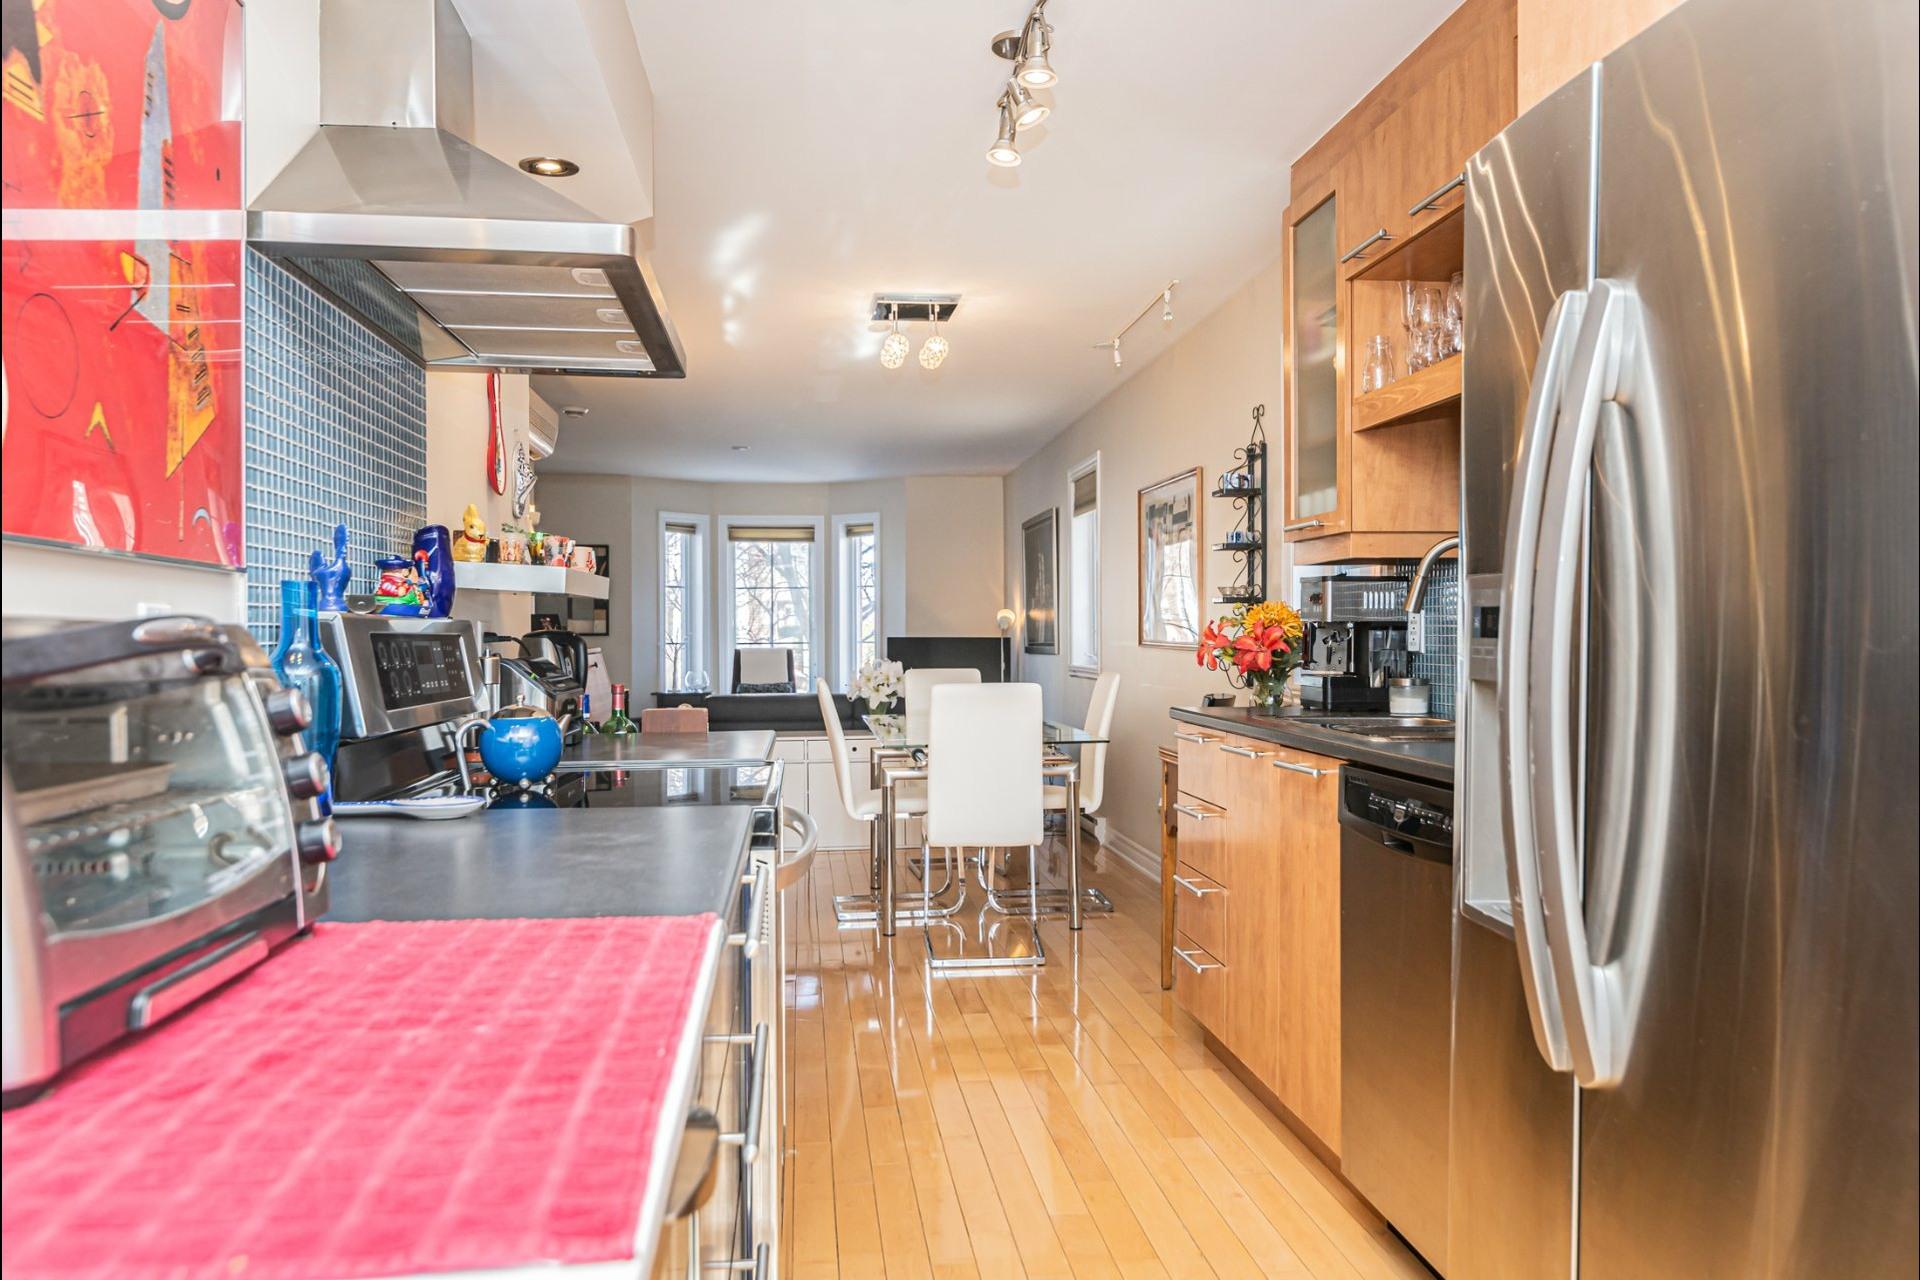 image 8 - Departamento En venta Saint-Laurent Montréal  - 4 habitaciones